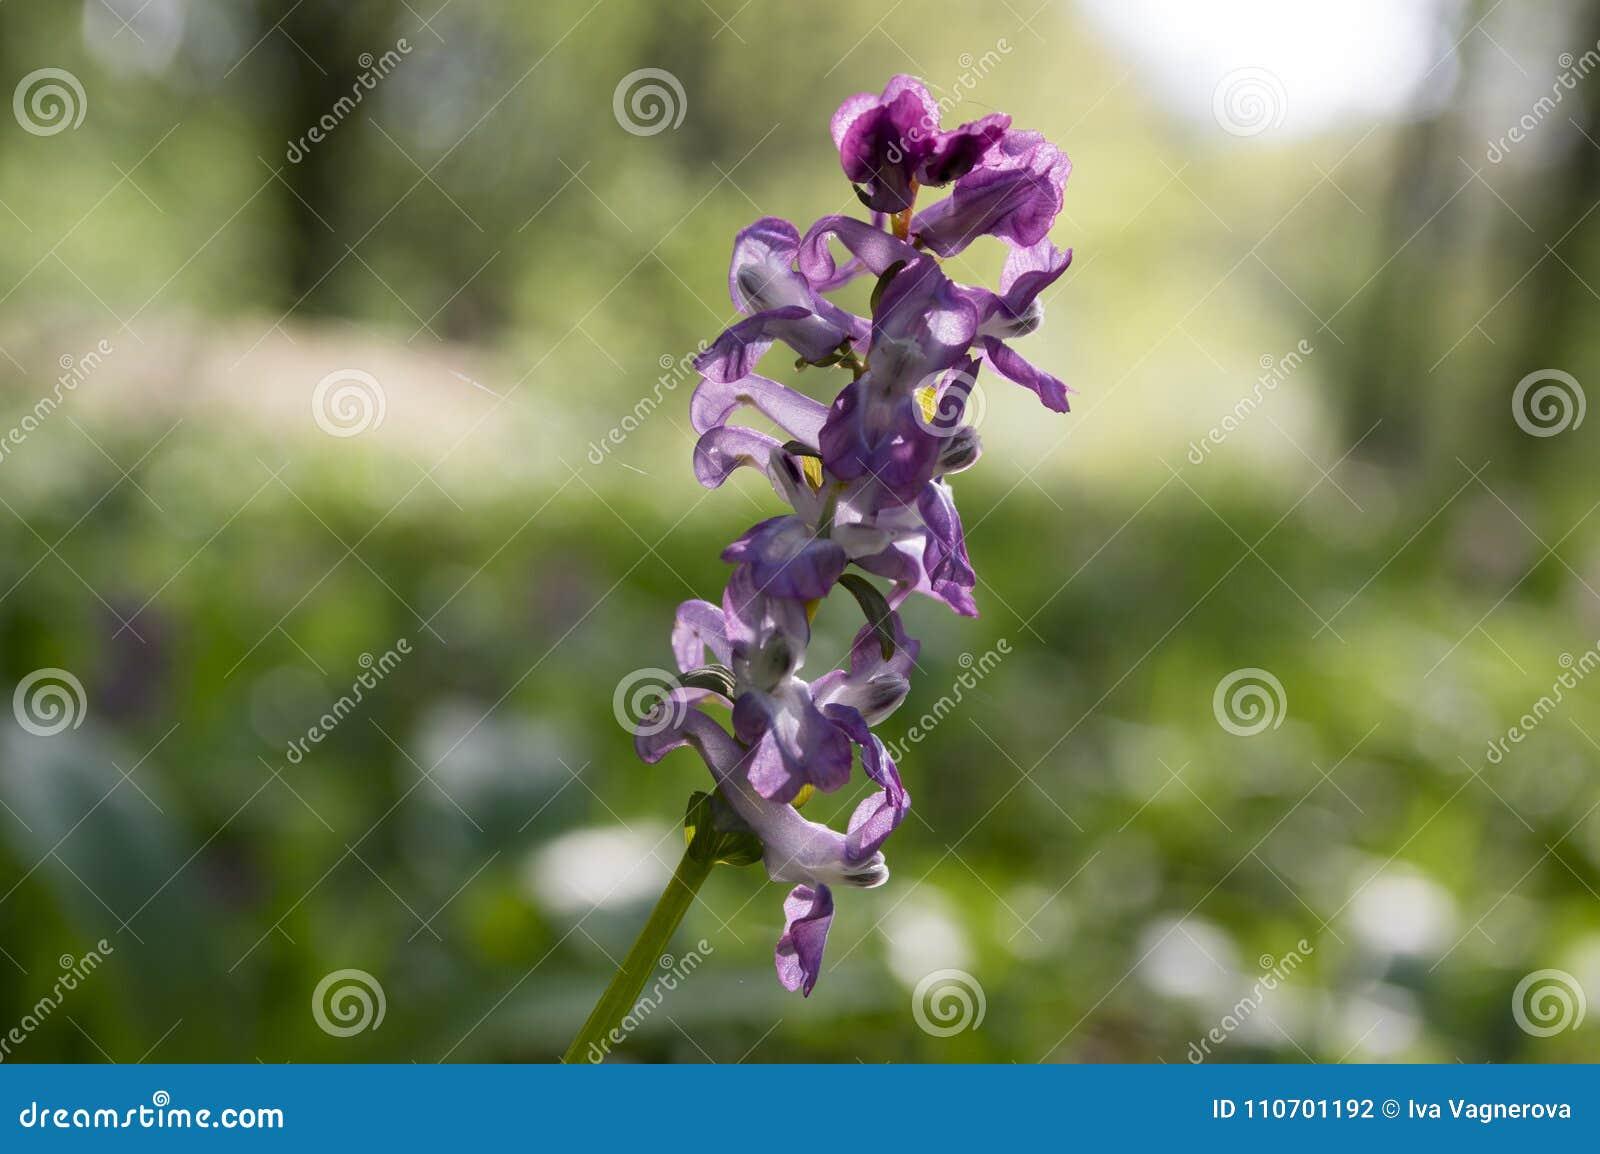 Corydalis Cava Violet Spring Flower In Bloom Stock Photo Image Of